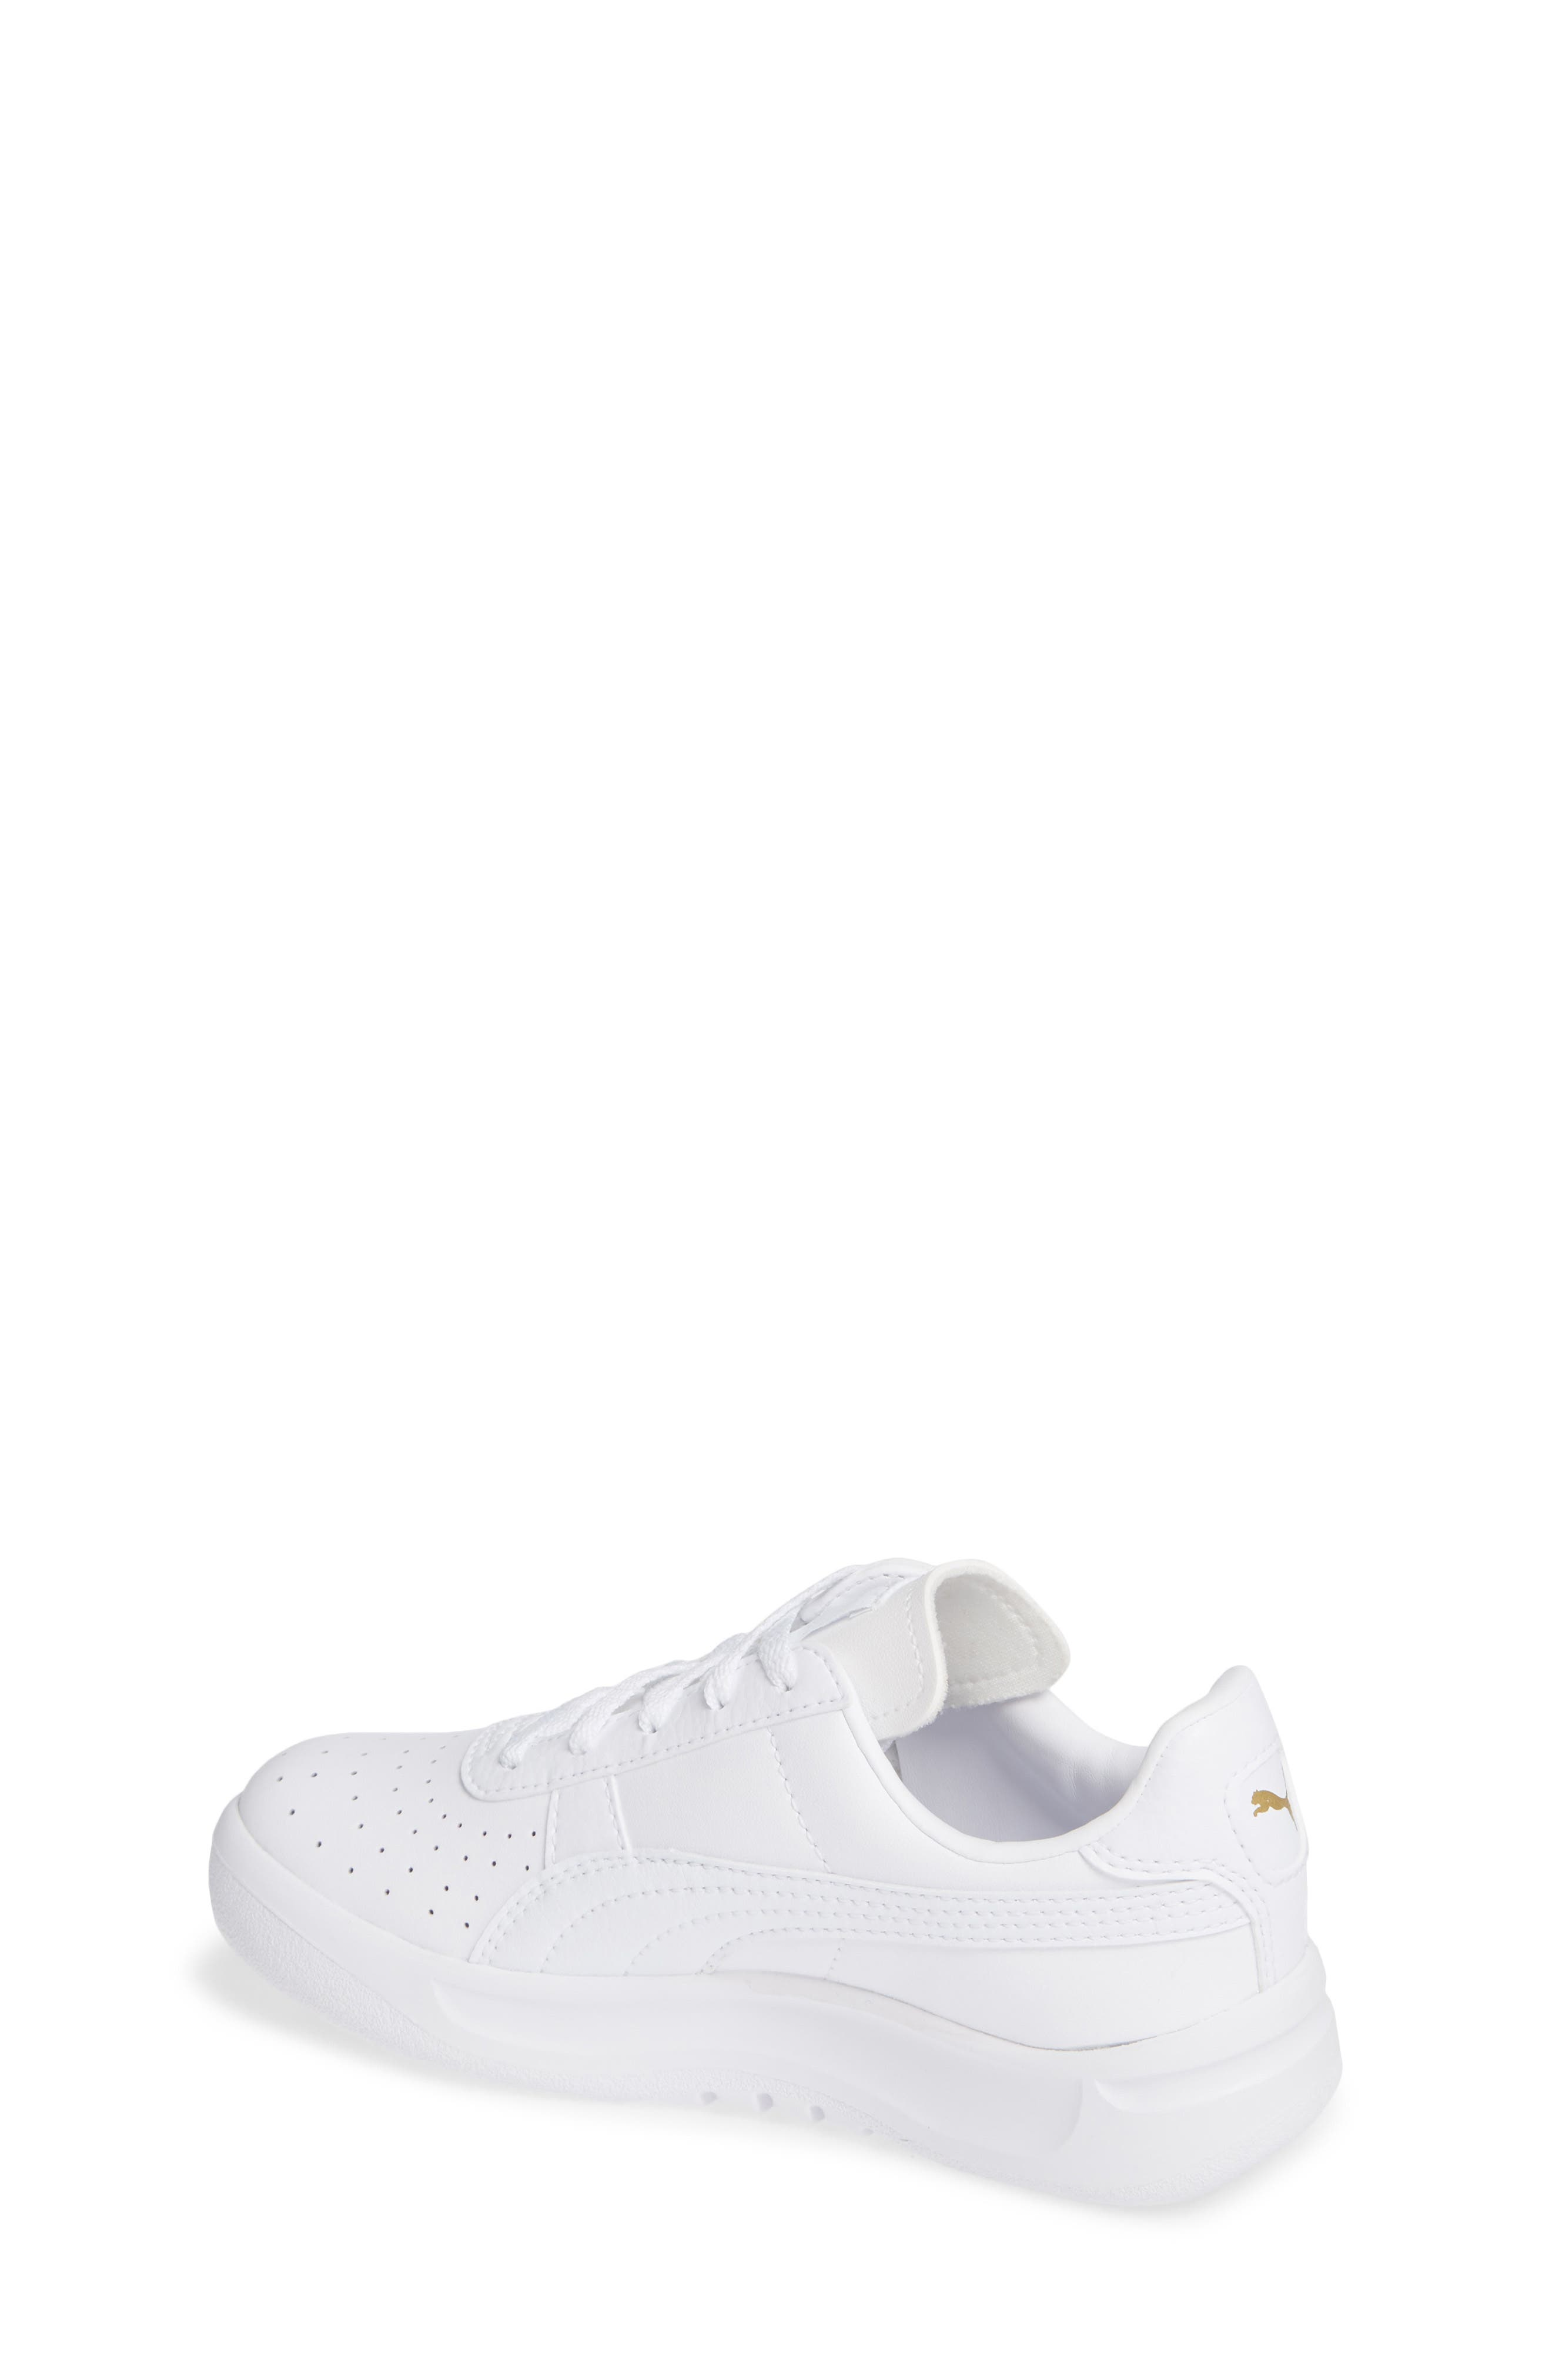 PUMA, 'GV Special' Sneaker, Alternate thumbnail 2, color, PUMA WHITE-PUMA TEAM GOLD